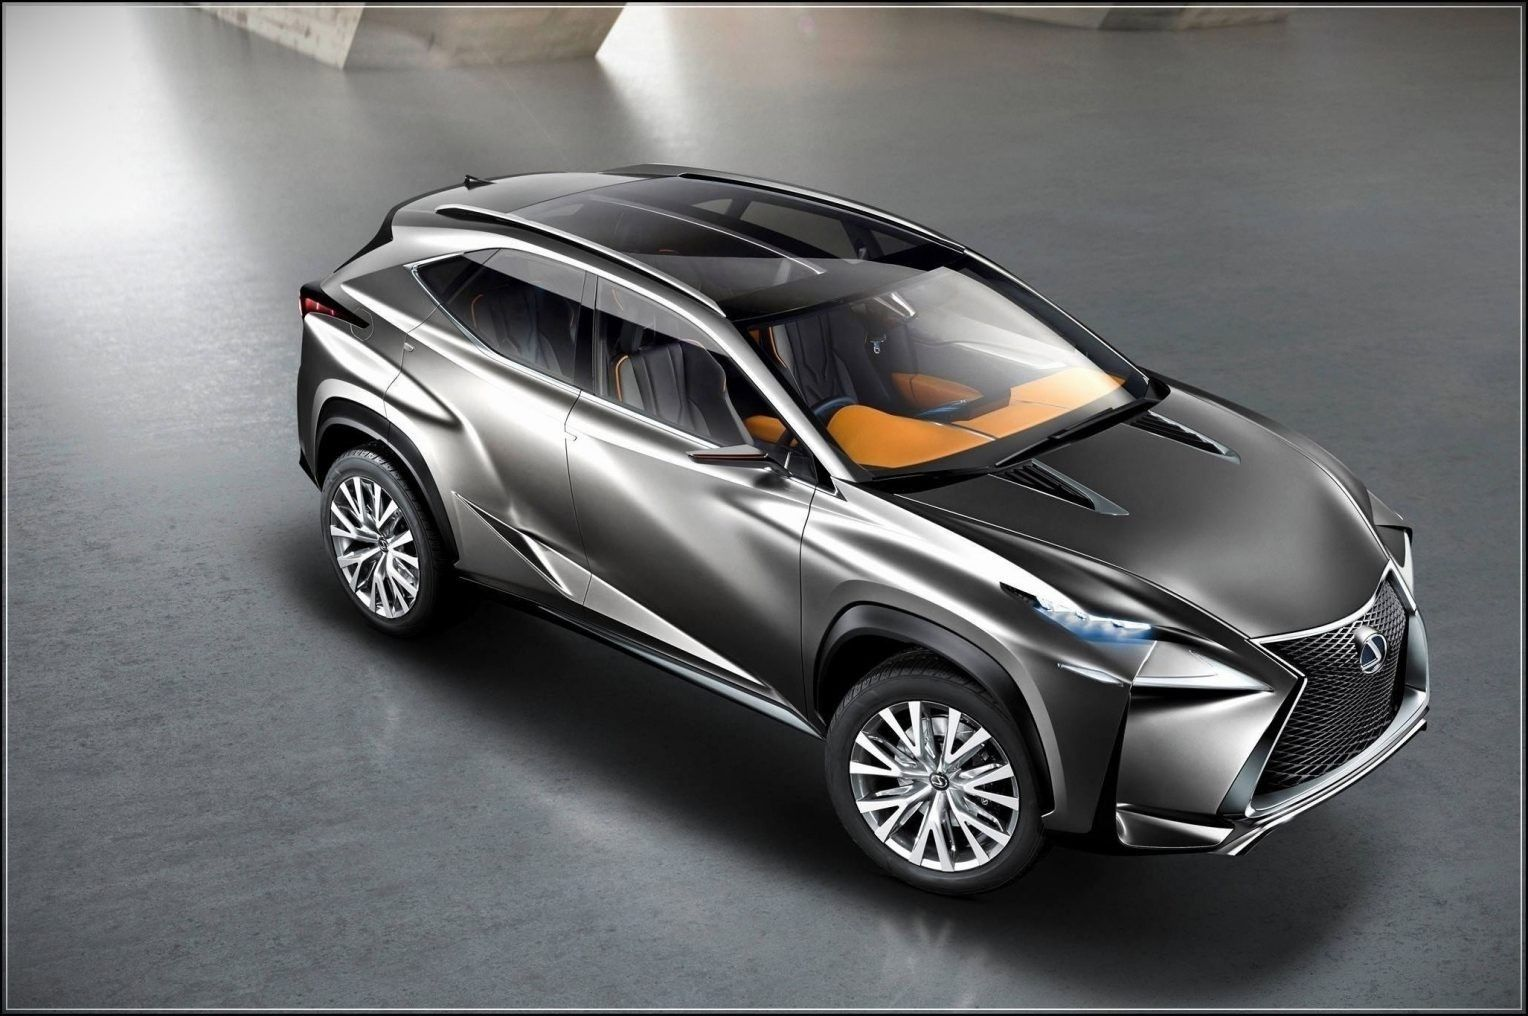 2019 Lexus Rx 350 New Interior Lexus rx 350, Lexus suv